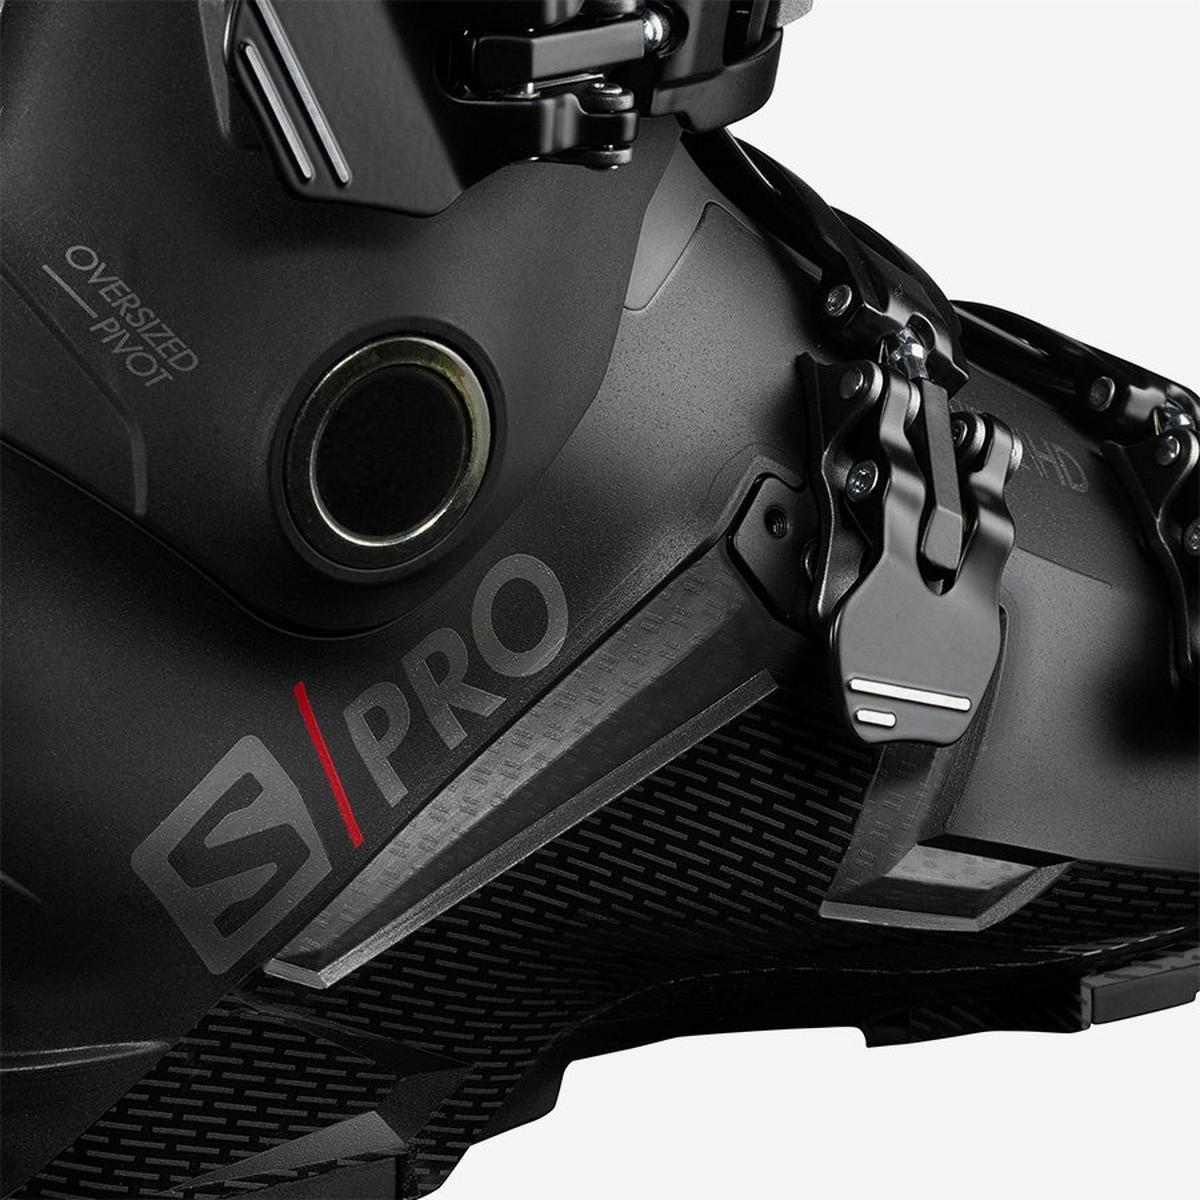 Salomon Men's S/Pro 120 - Black / Beluga